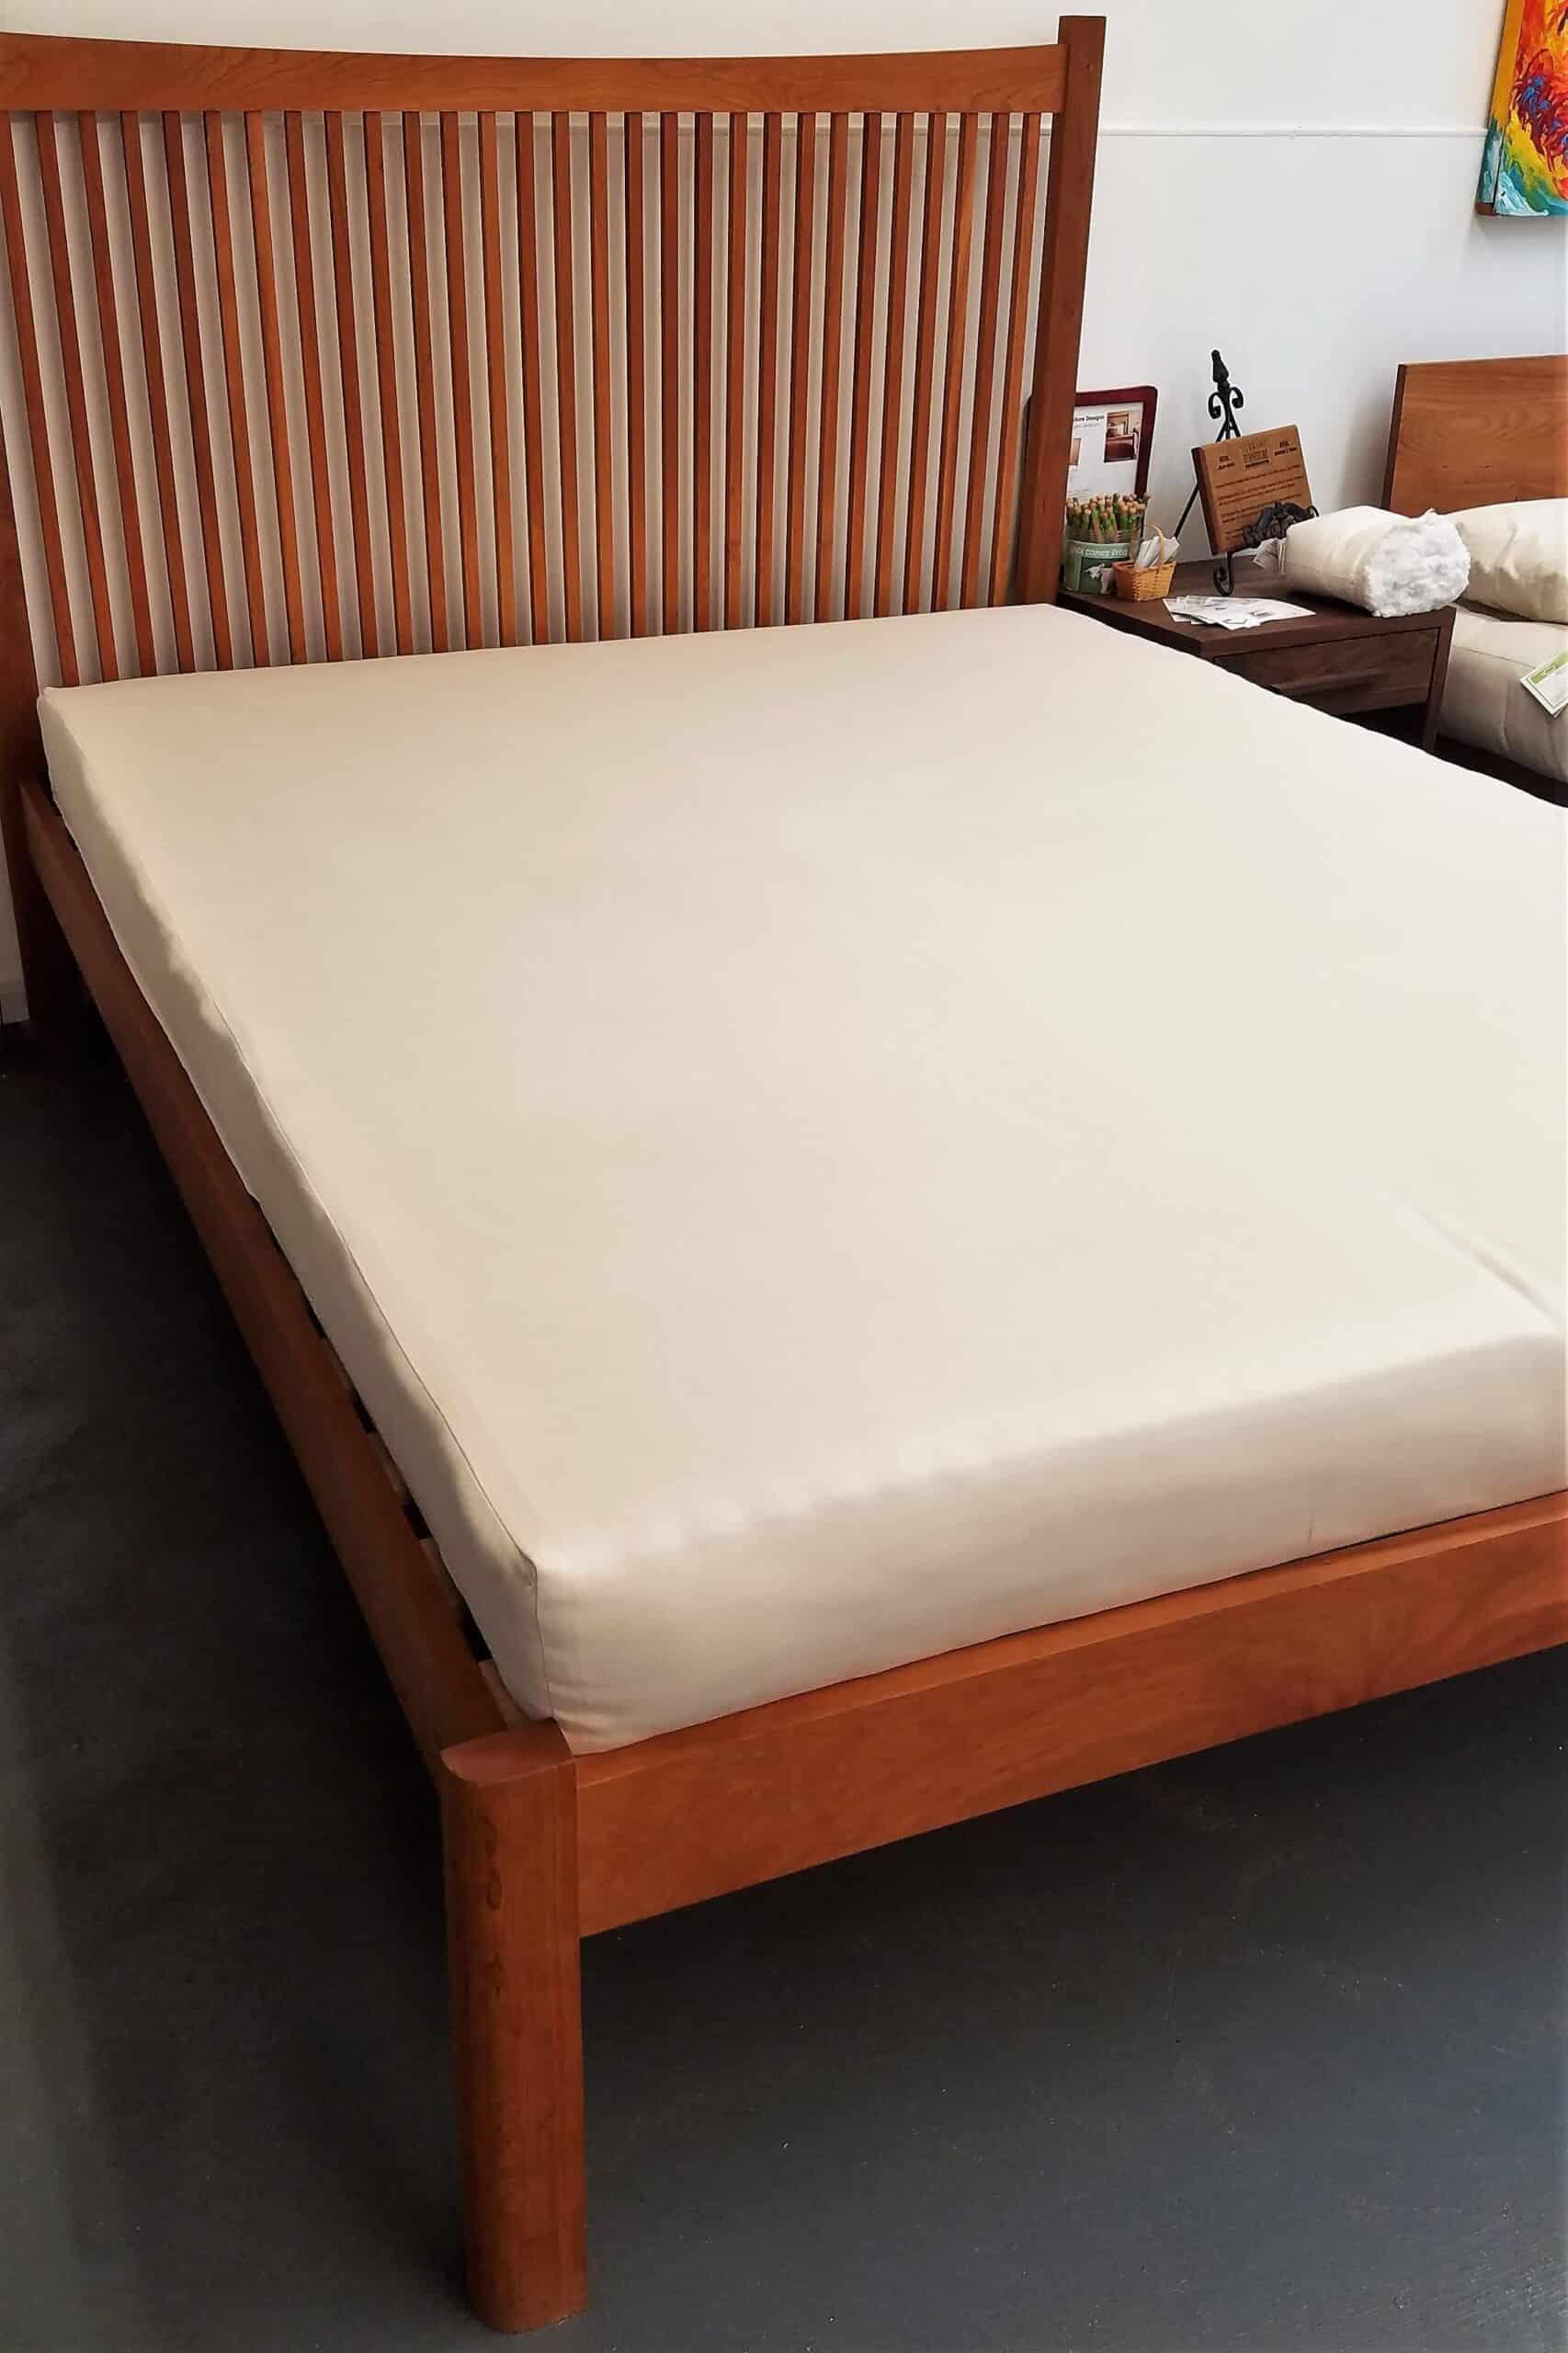 Evergreen Foam Mattress by White Lotus Home